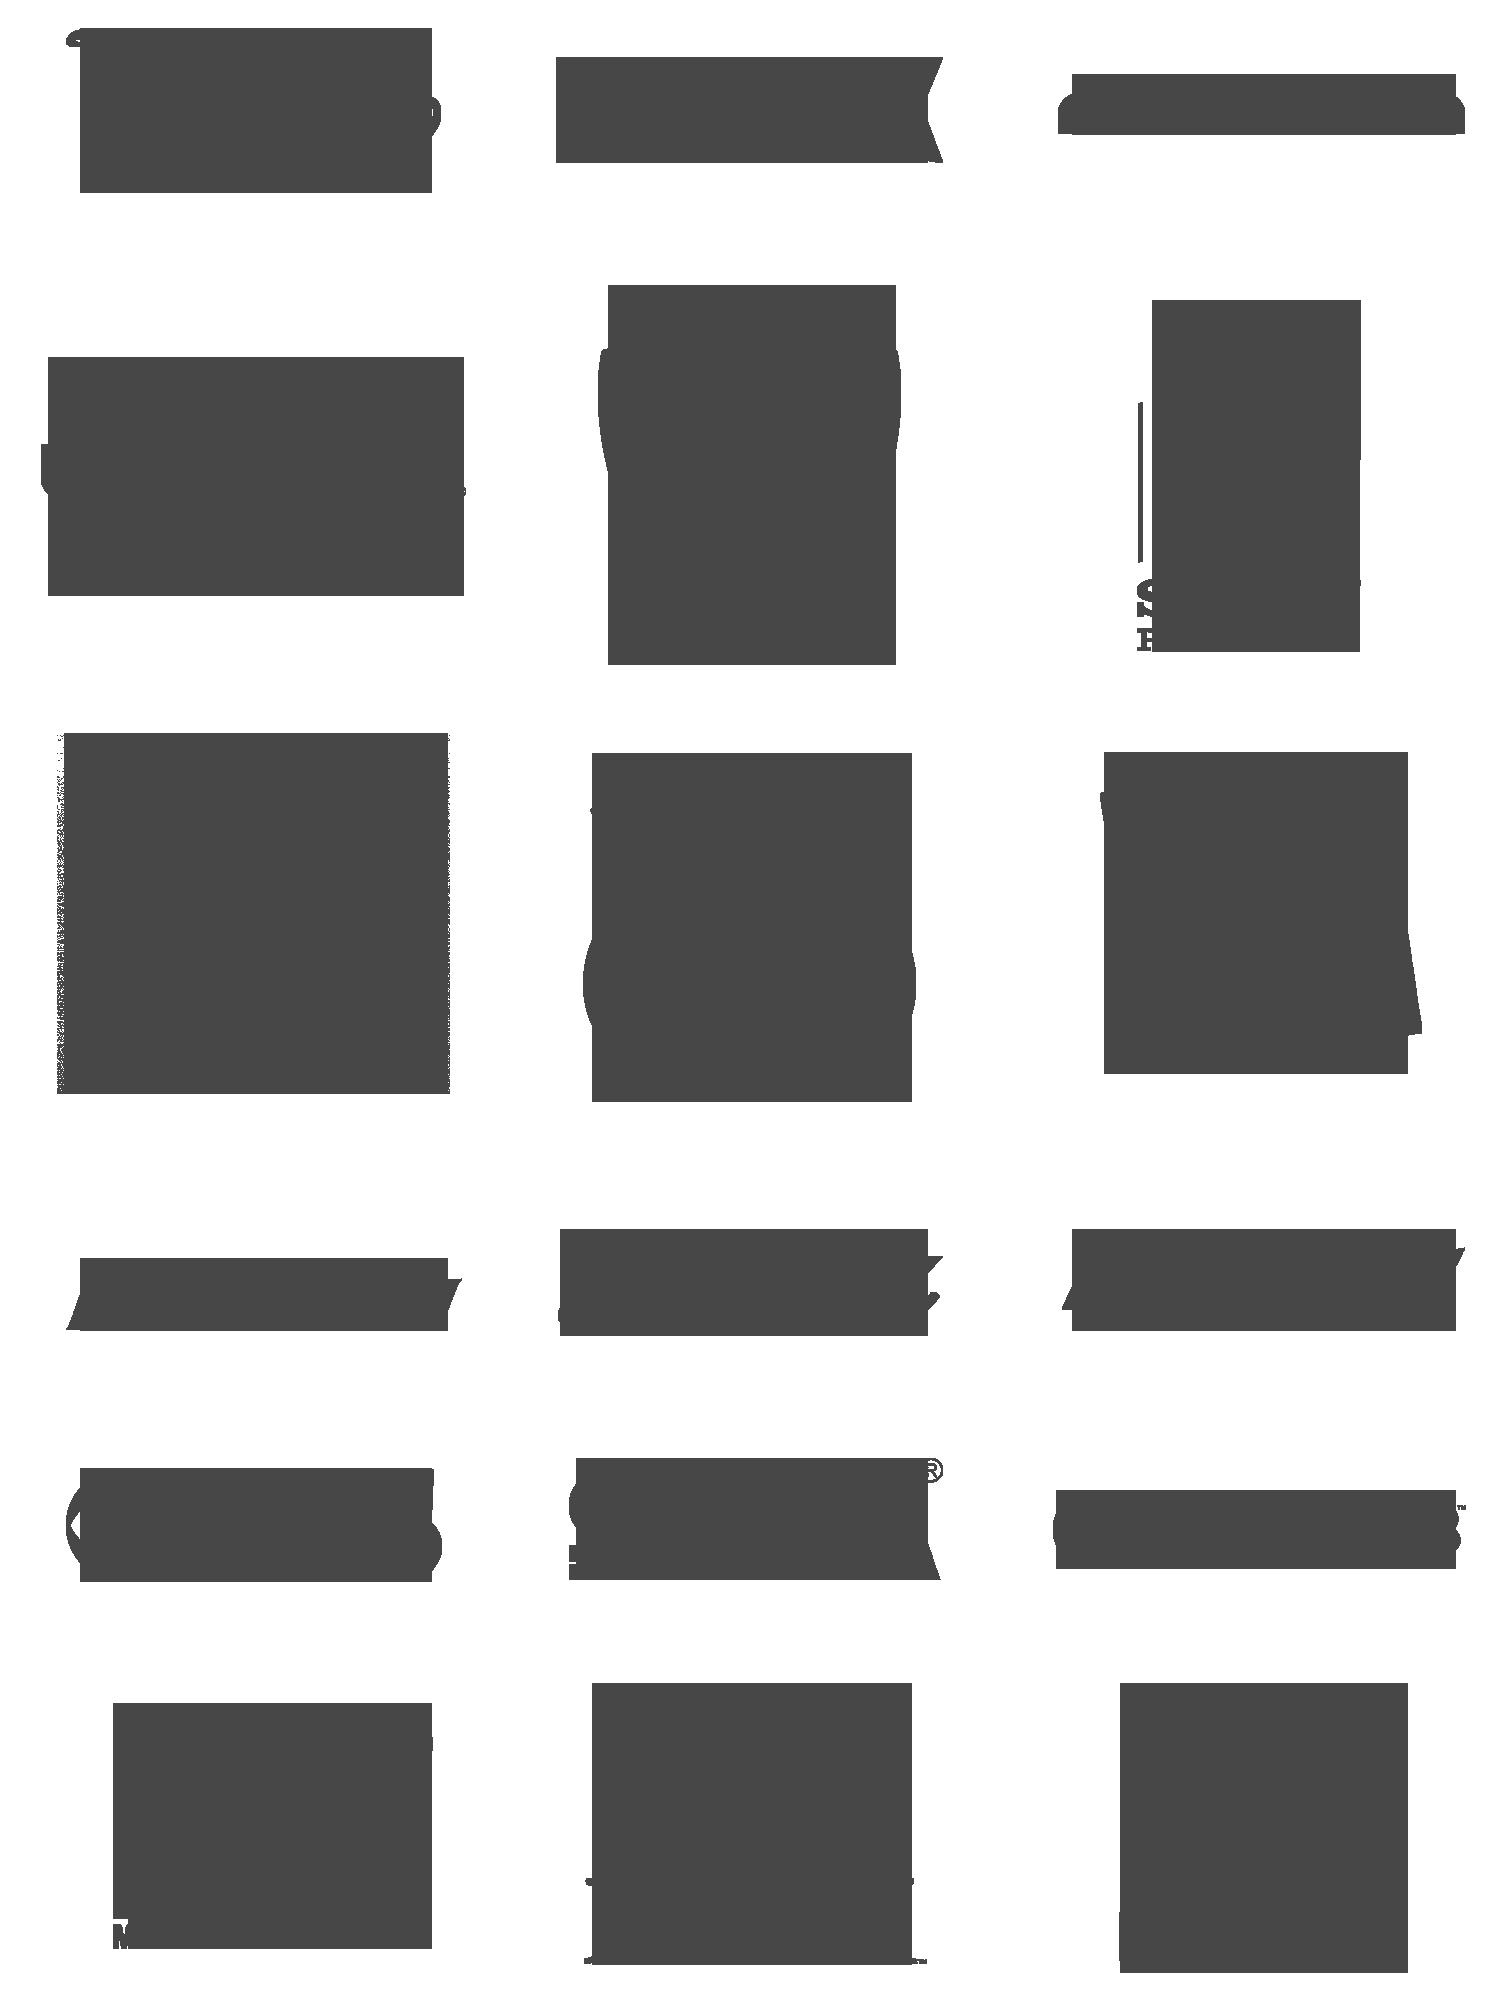 https://www.shirt-store.com/pub_docs/files/OfficialMerchandise/Lecensed_Logos.png